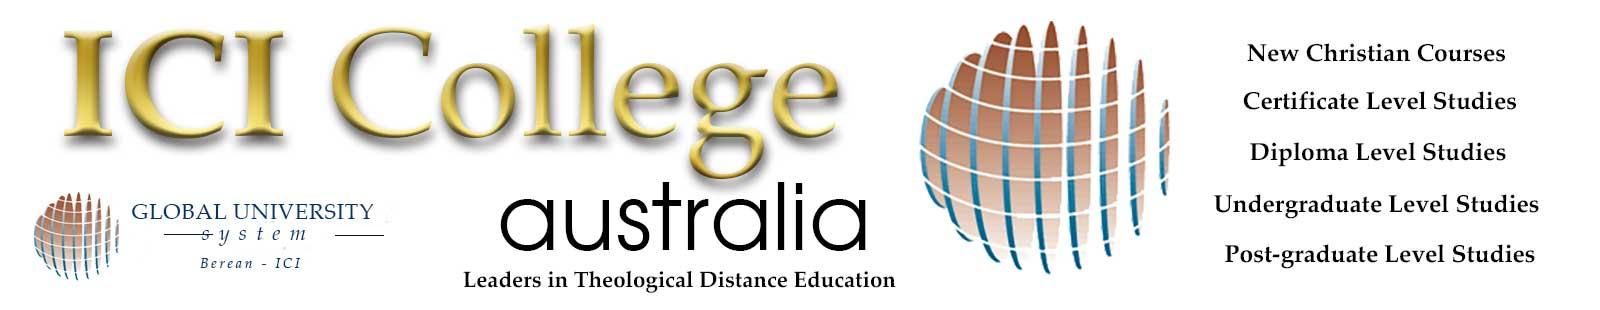 ICI College Australia, Payment Options